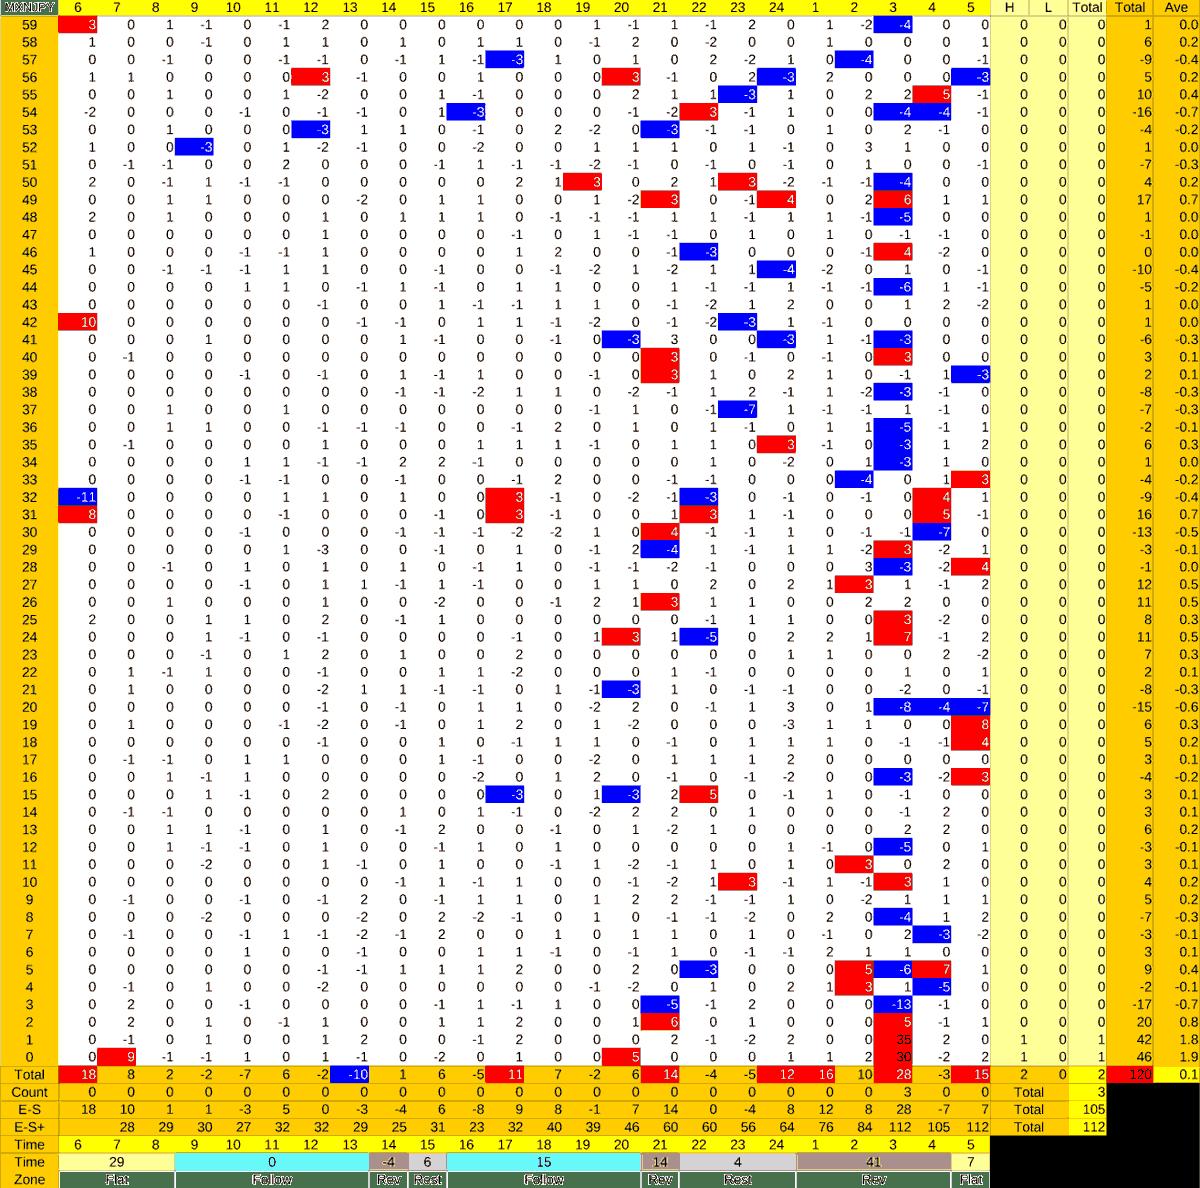 20210624_HS(3)MXNJPY